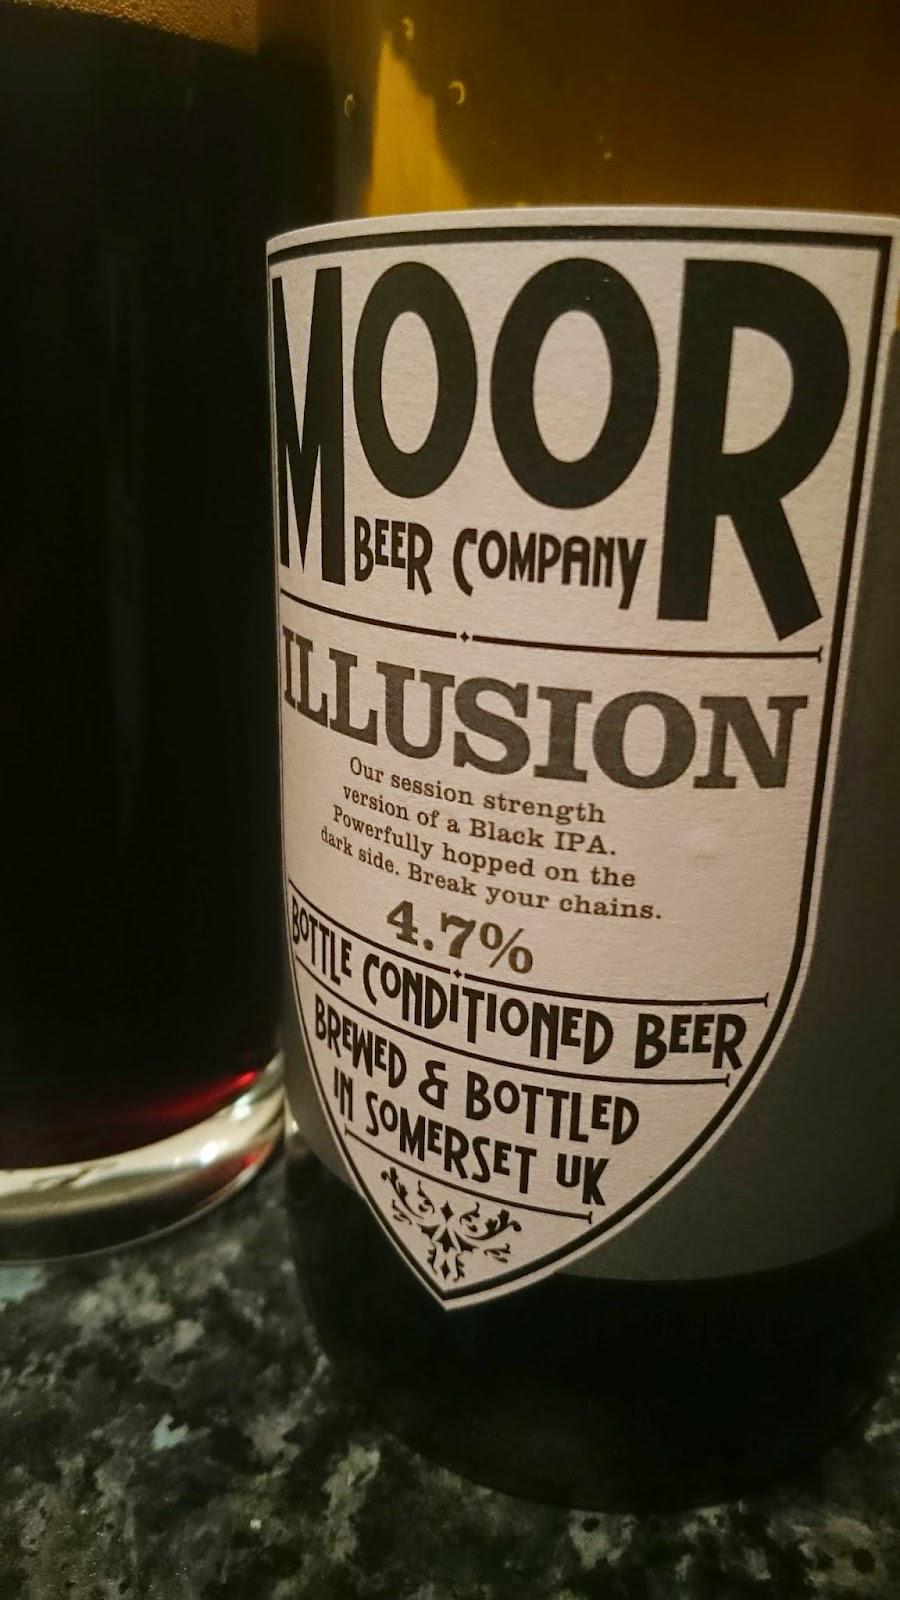 Moor Beer Company Illusion